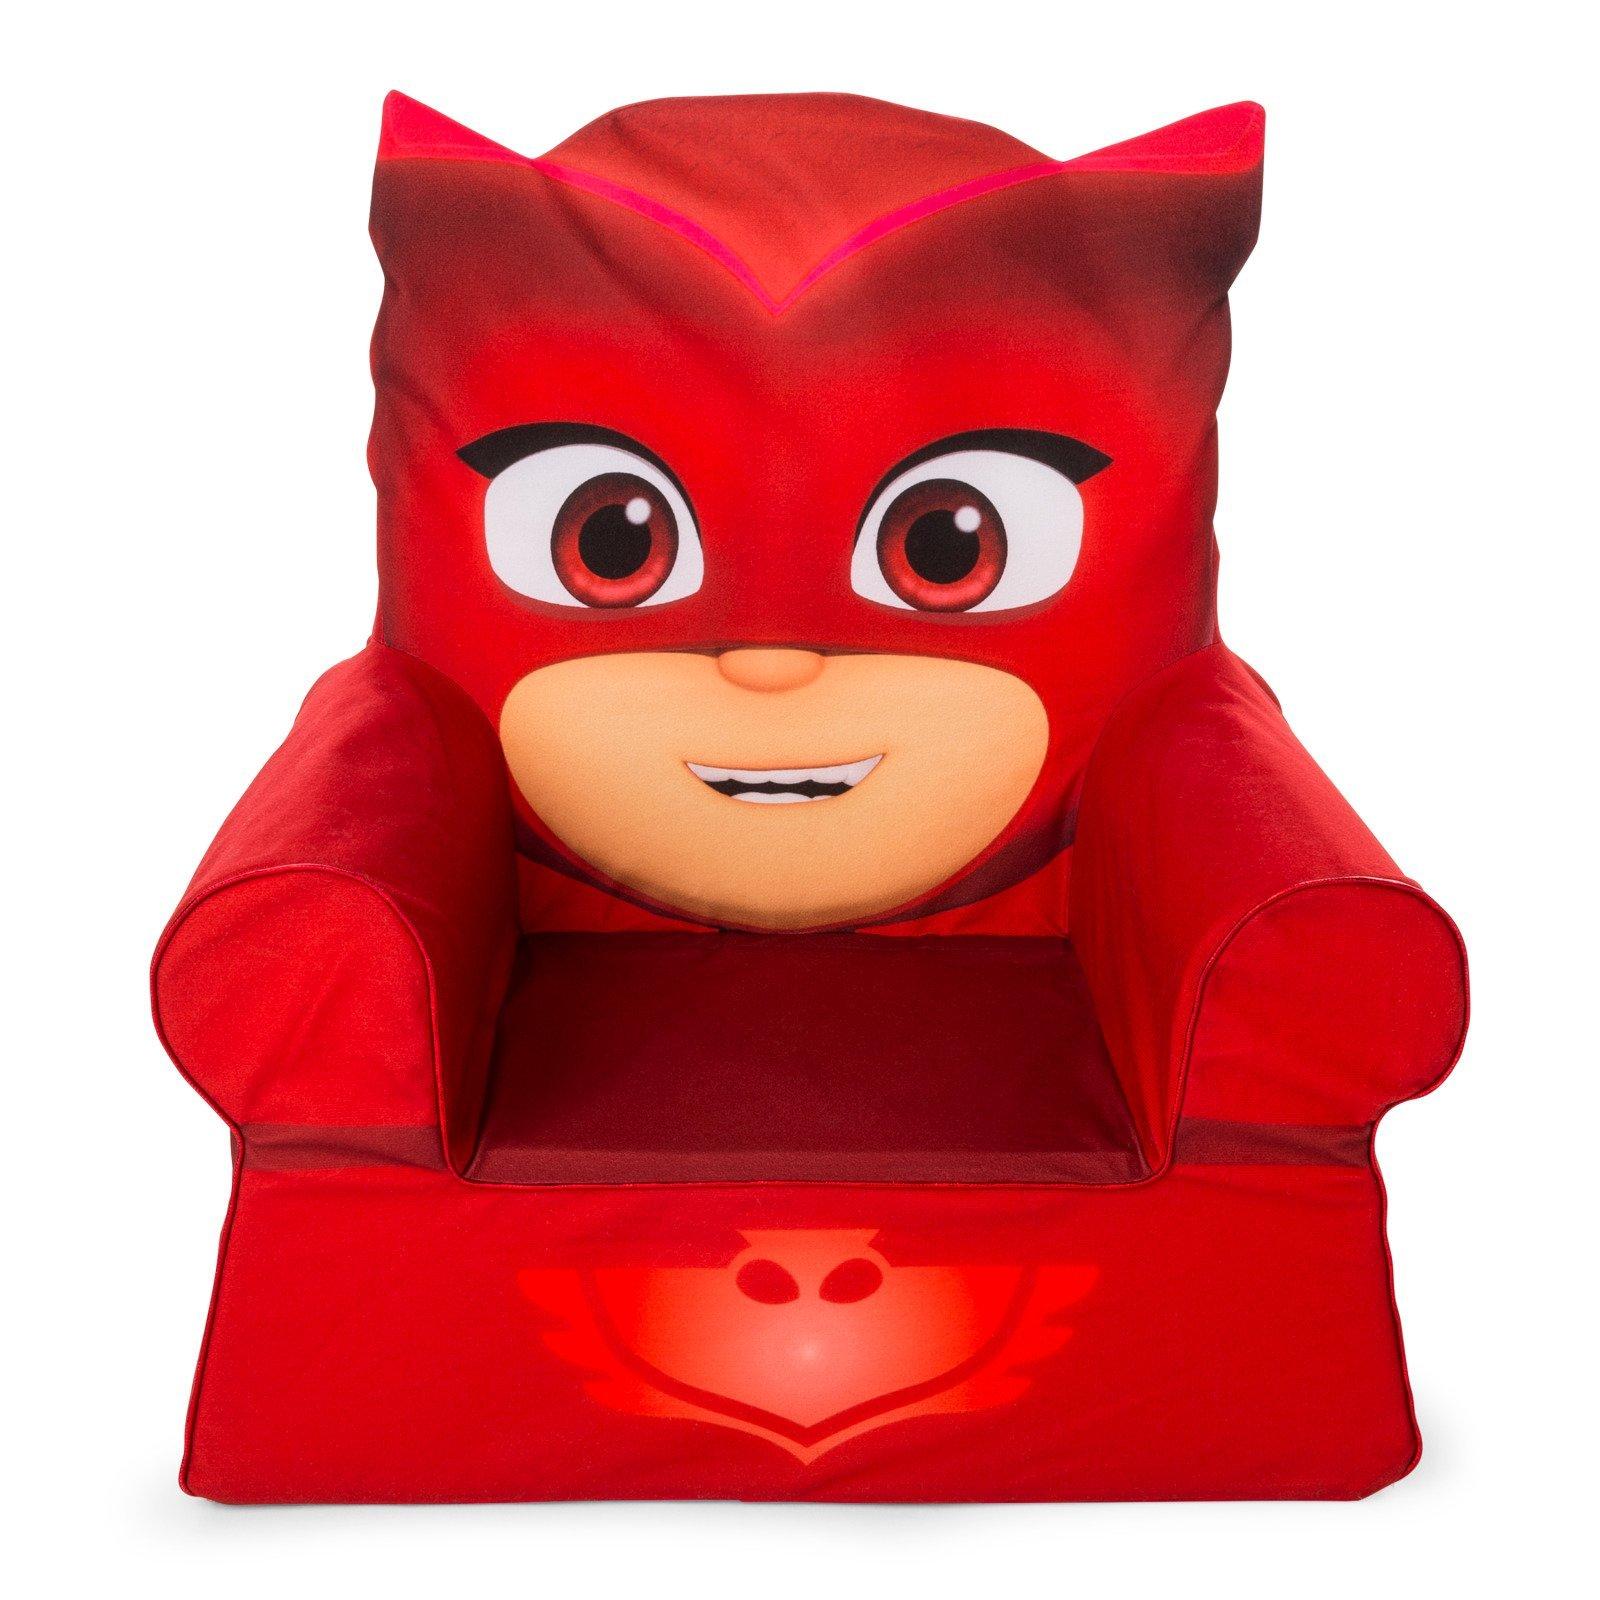 Marshmallow Furniture, Children's Foam Comfy Chair, PJ Masks Owlette Spin Master